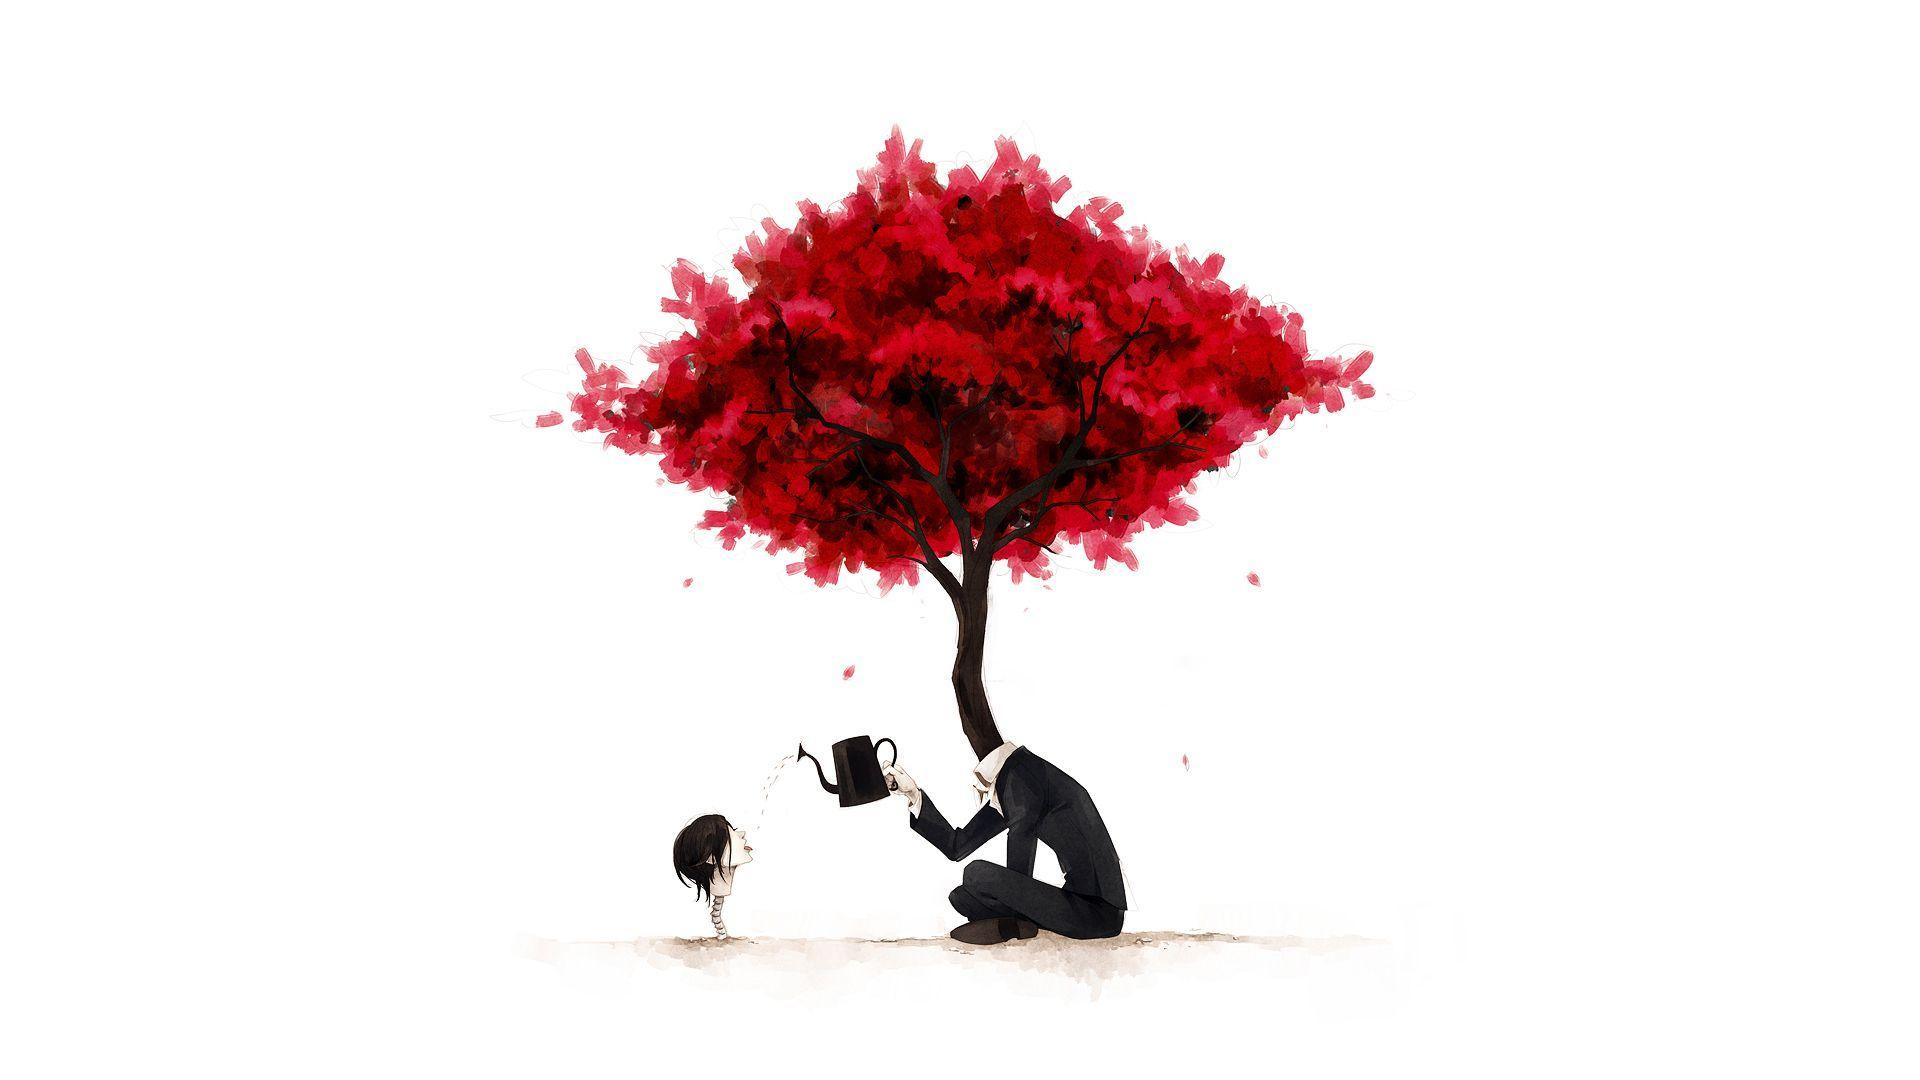 Заставки красное дерево сюрреализм